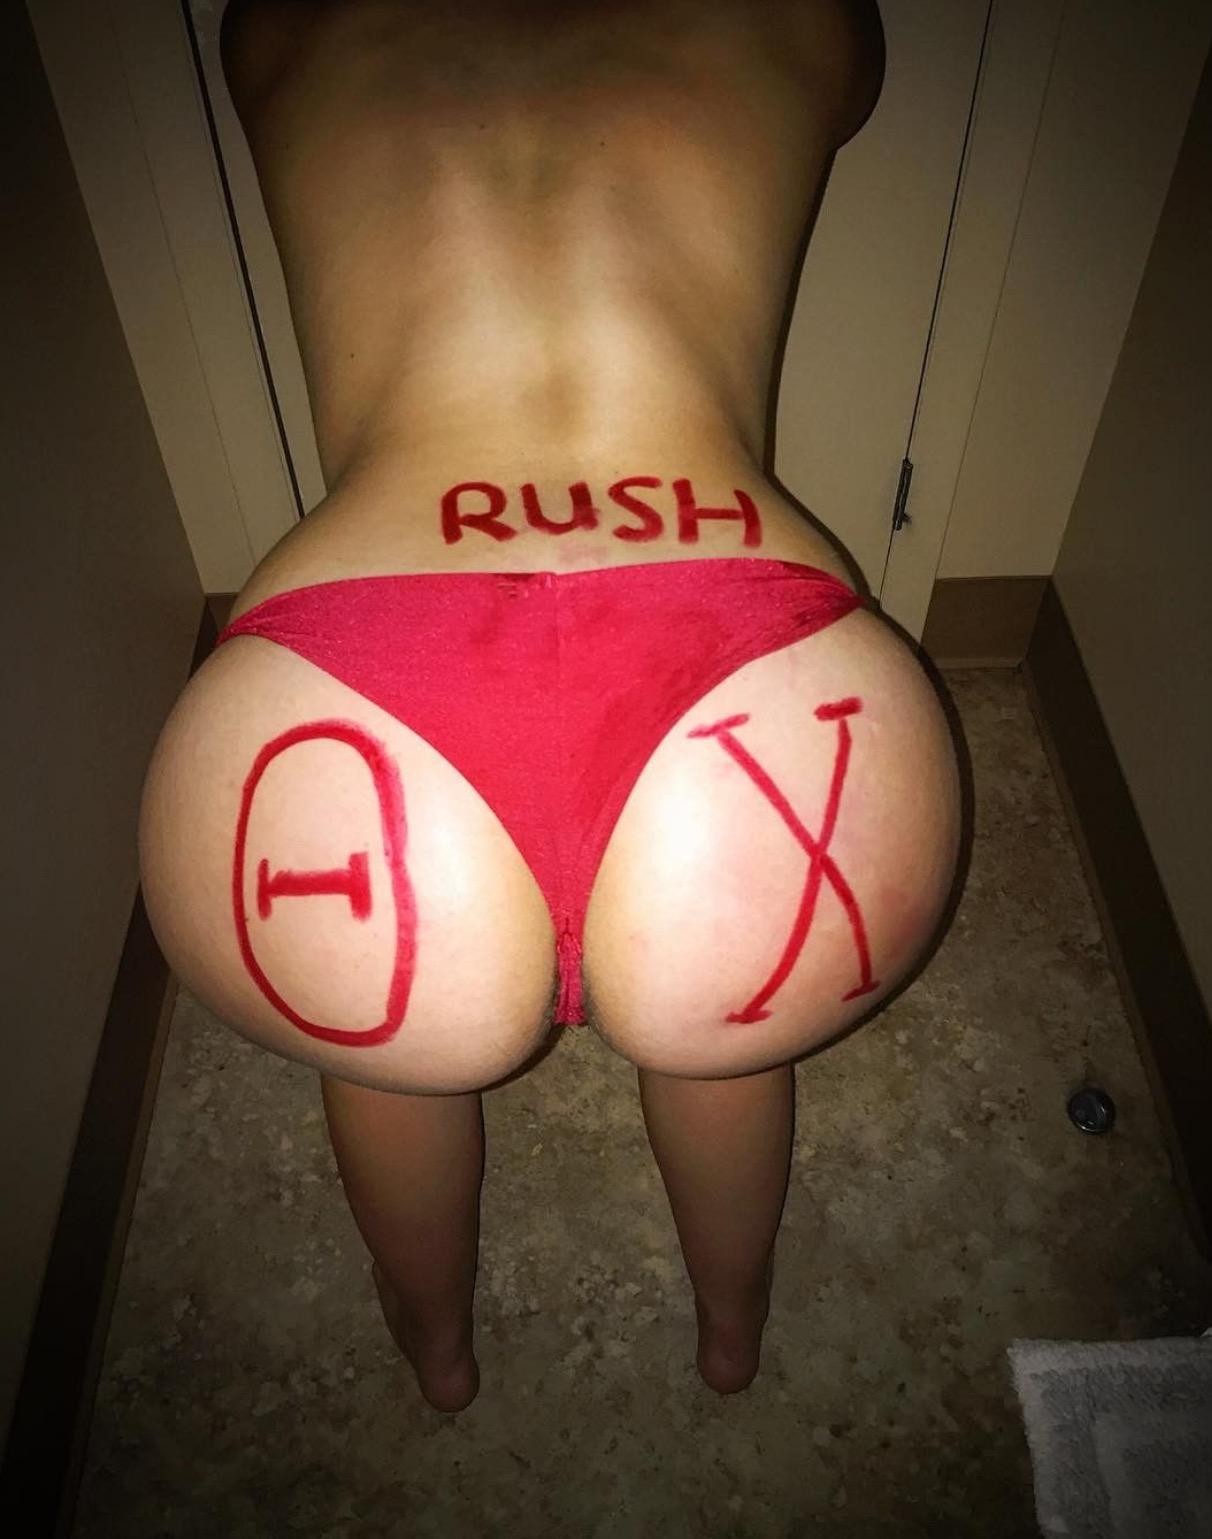 -anonymous-Rush_tits_-4e14c338c9fdf594fe273c88631a6966